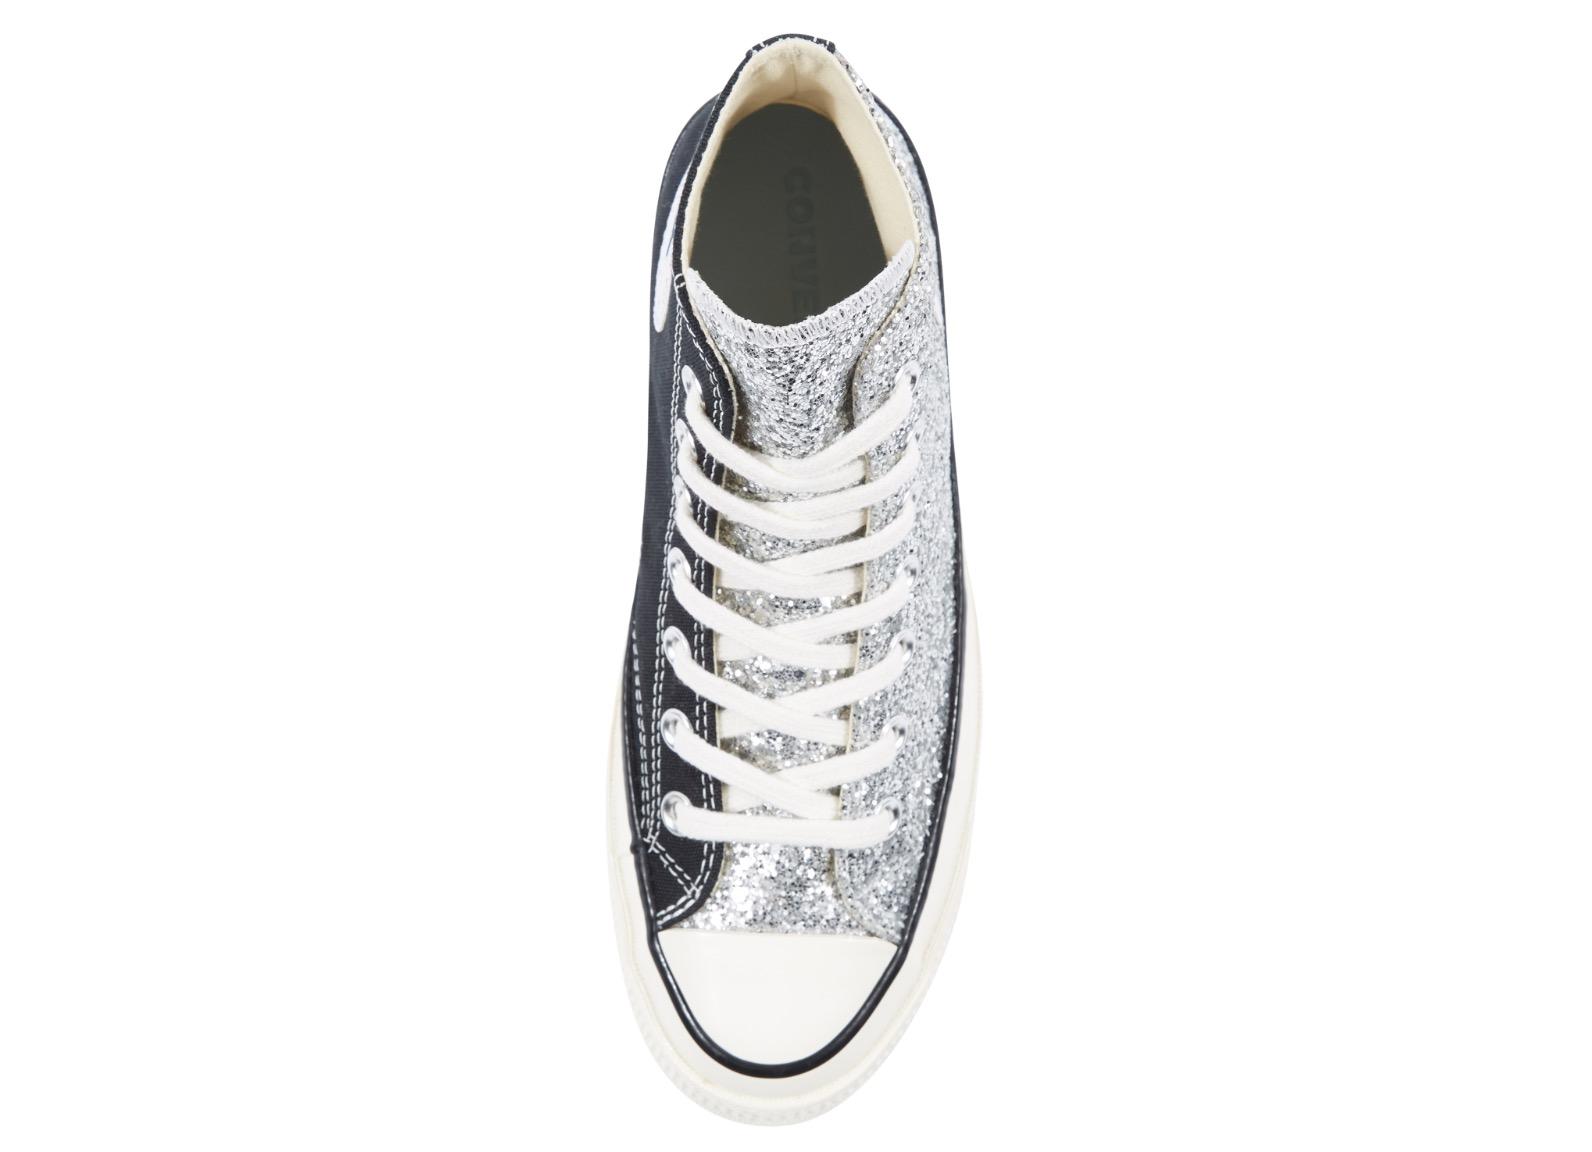 Converse x Chiara Chuck 70 Glitter High Top Black Silver | 563831C